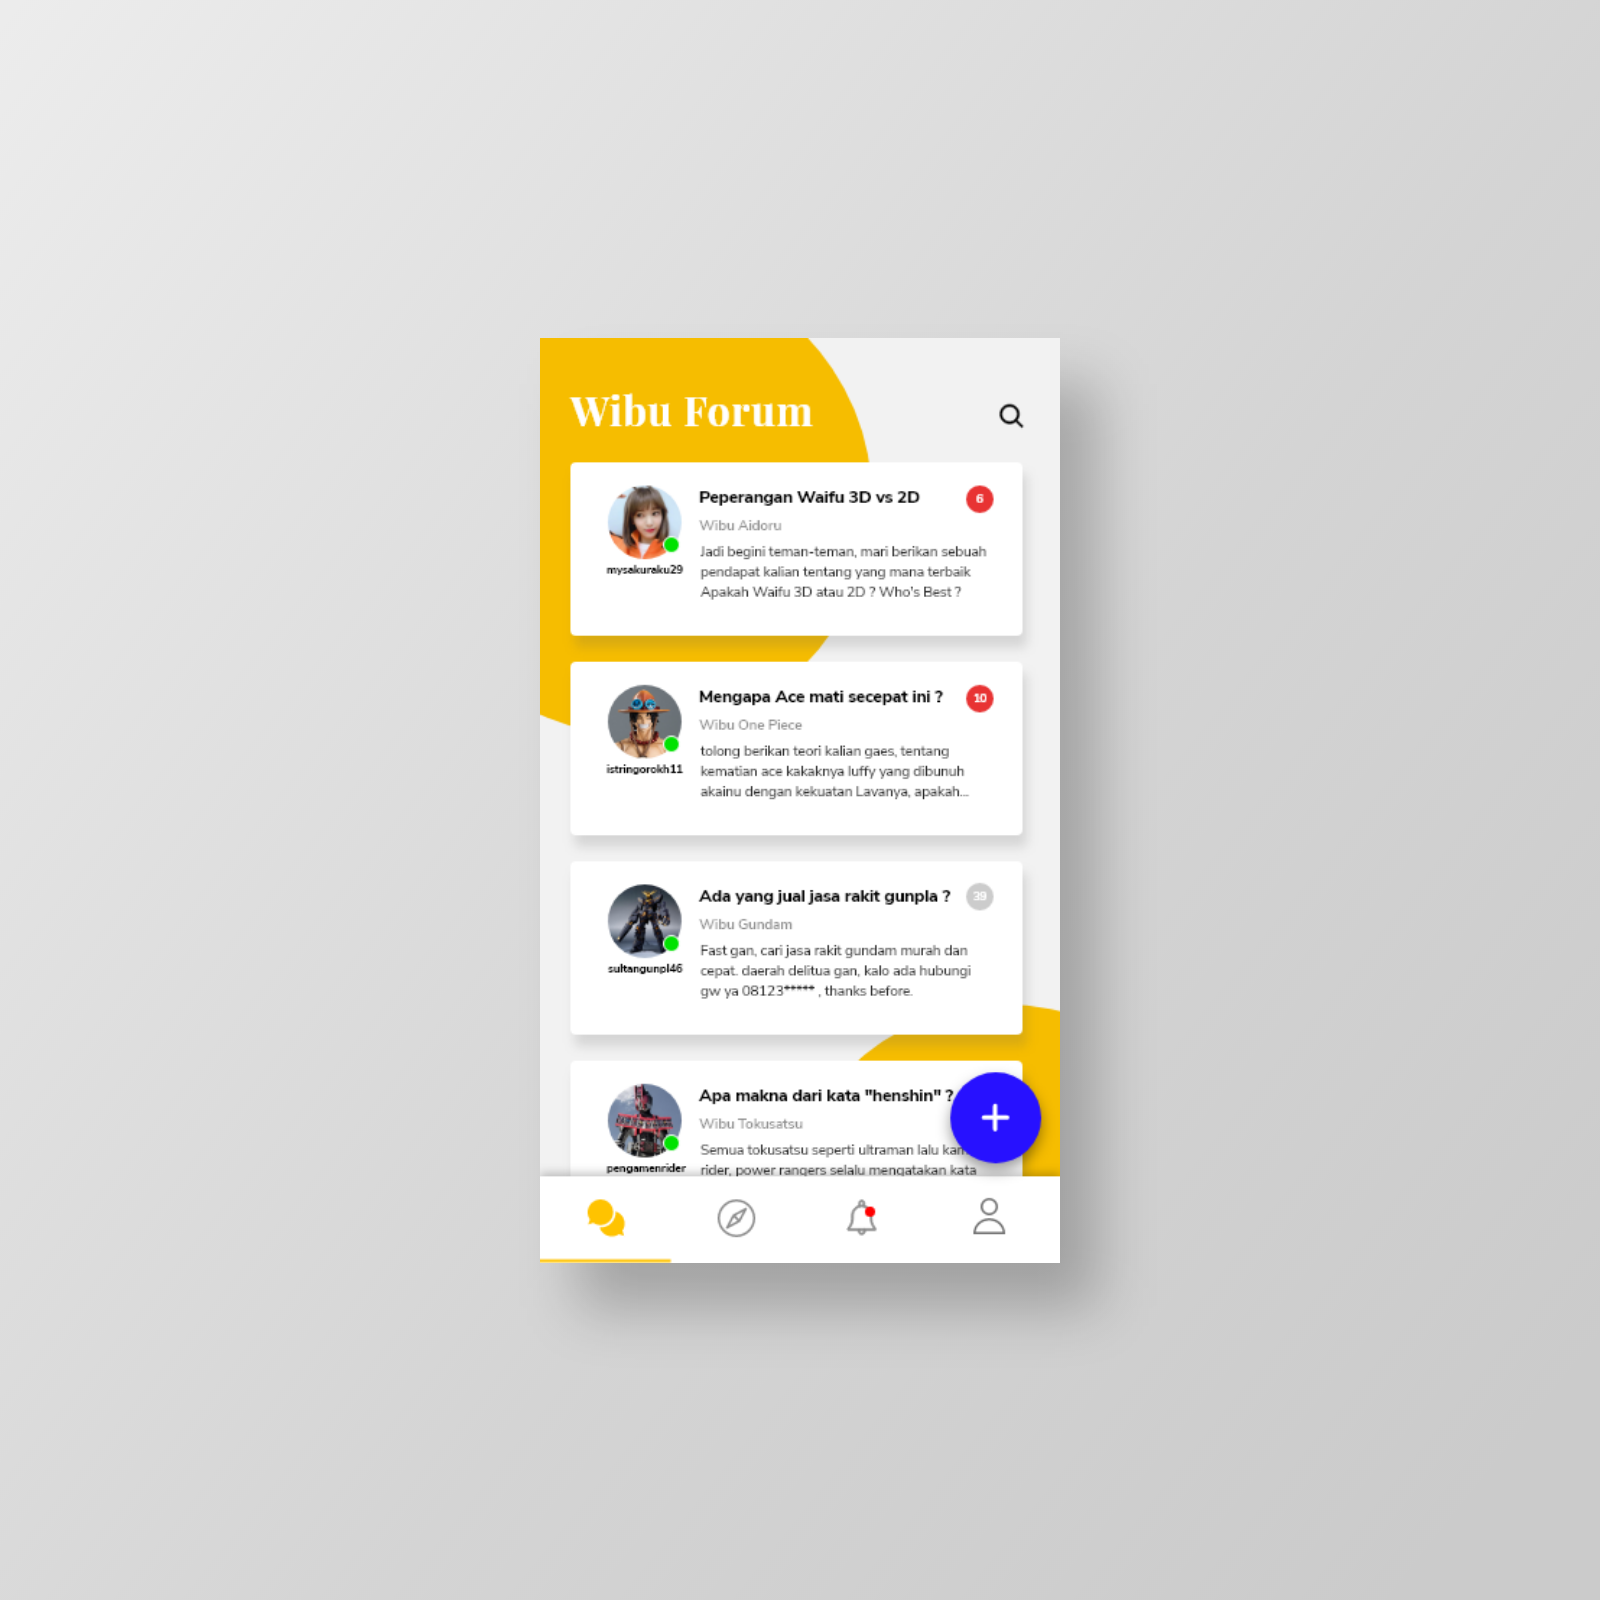 Thread Exploration UI Design - Wibu Forum App - UpLabs